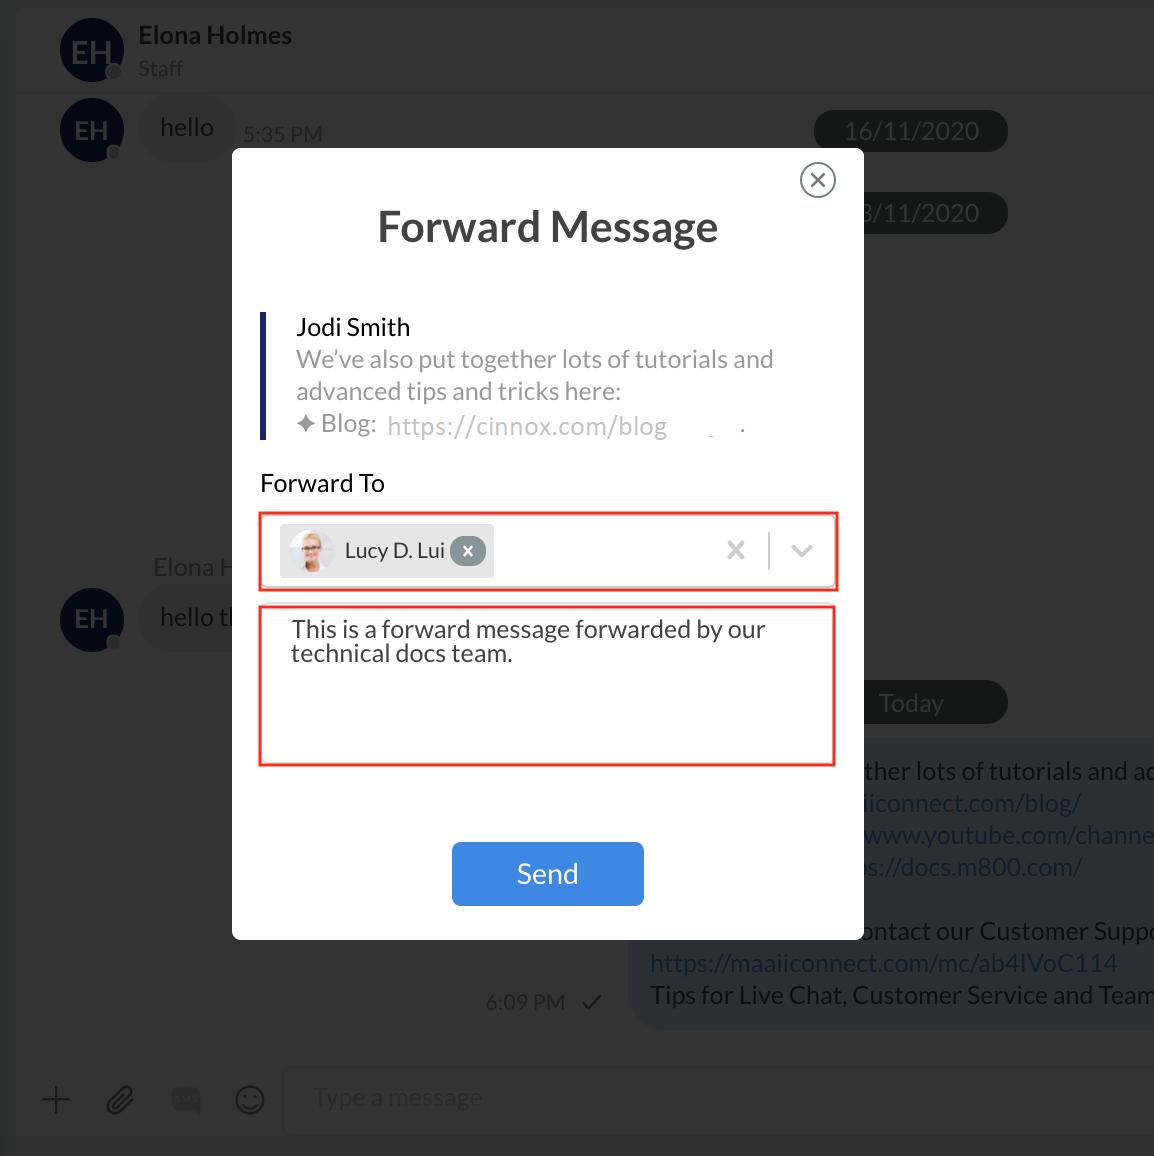 Forward message